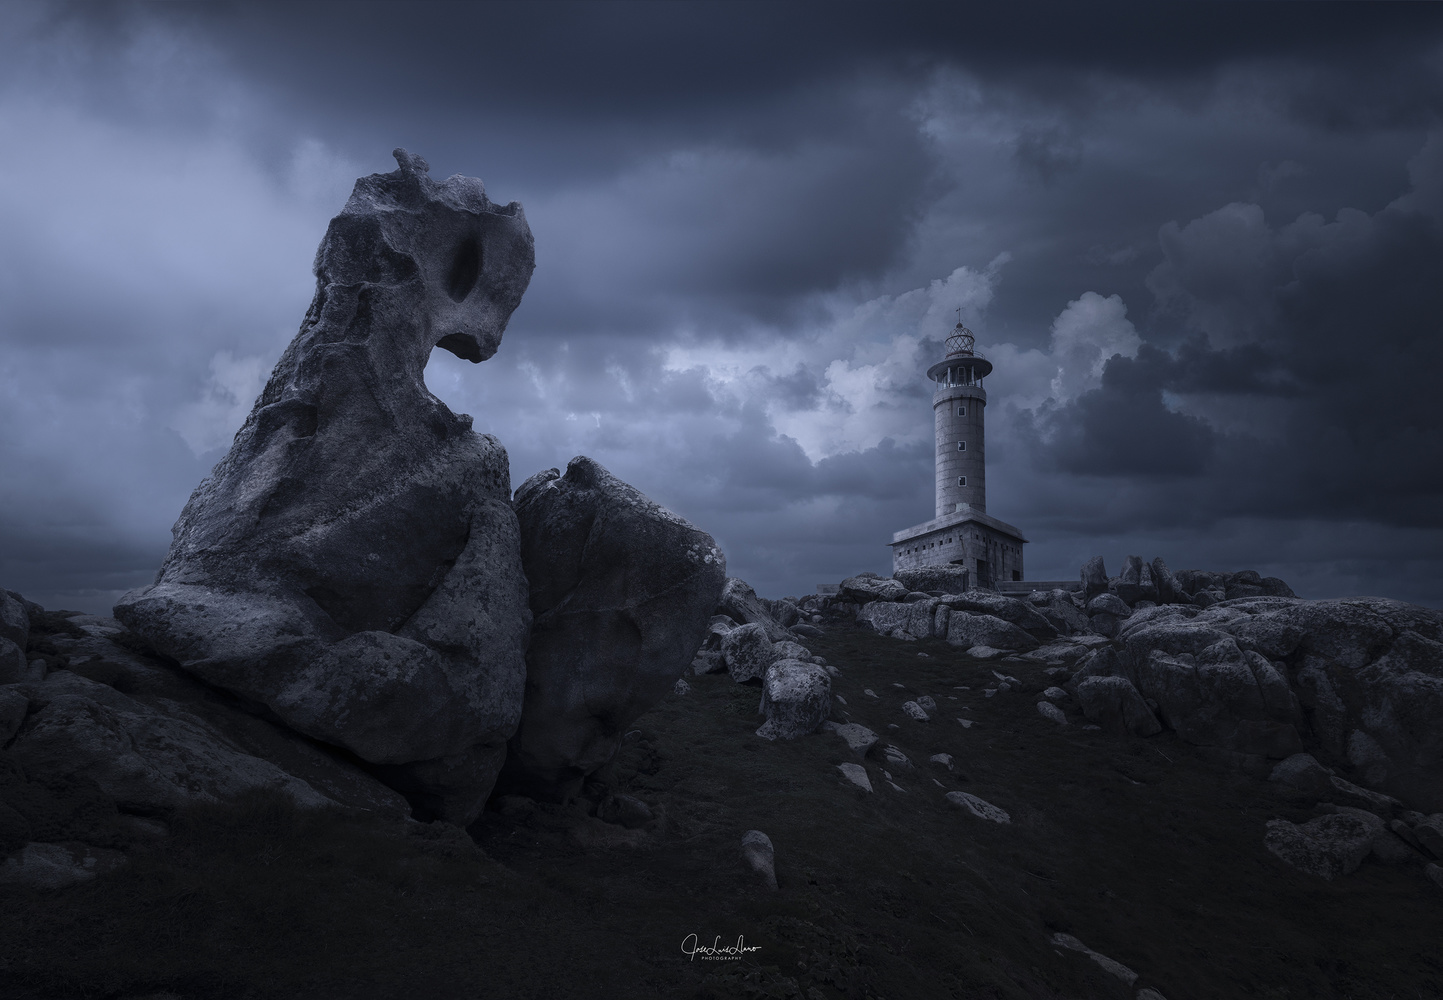 Nariga dark mood by Jose Luis Llano